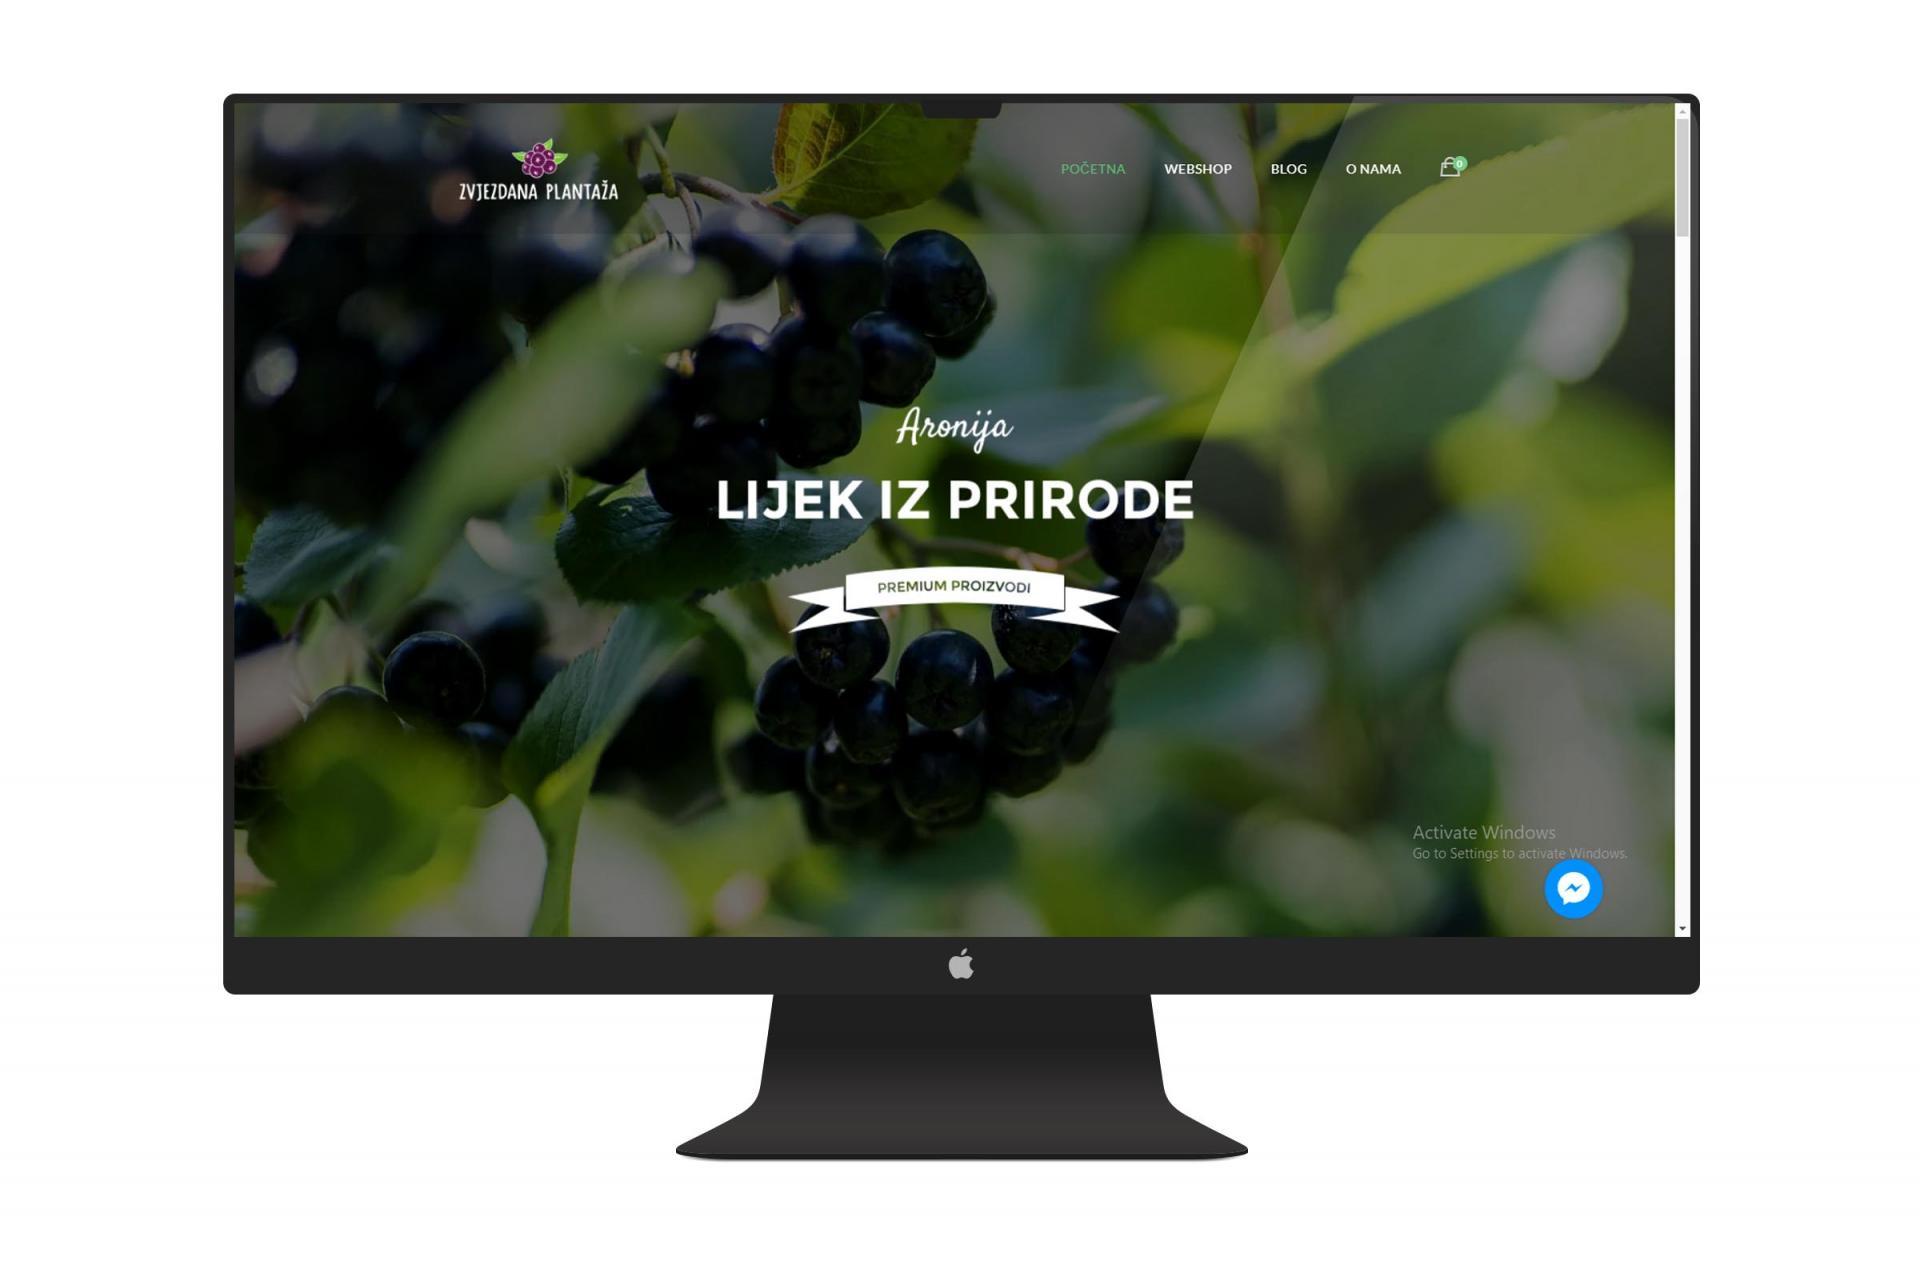 Zvjezdana plantaža web shop